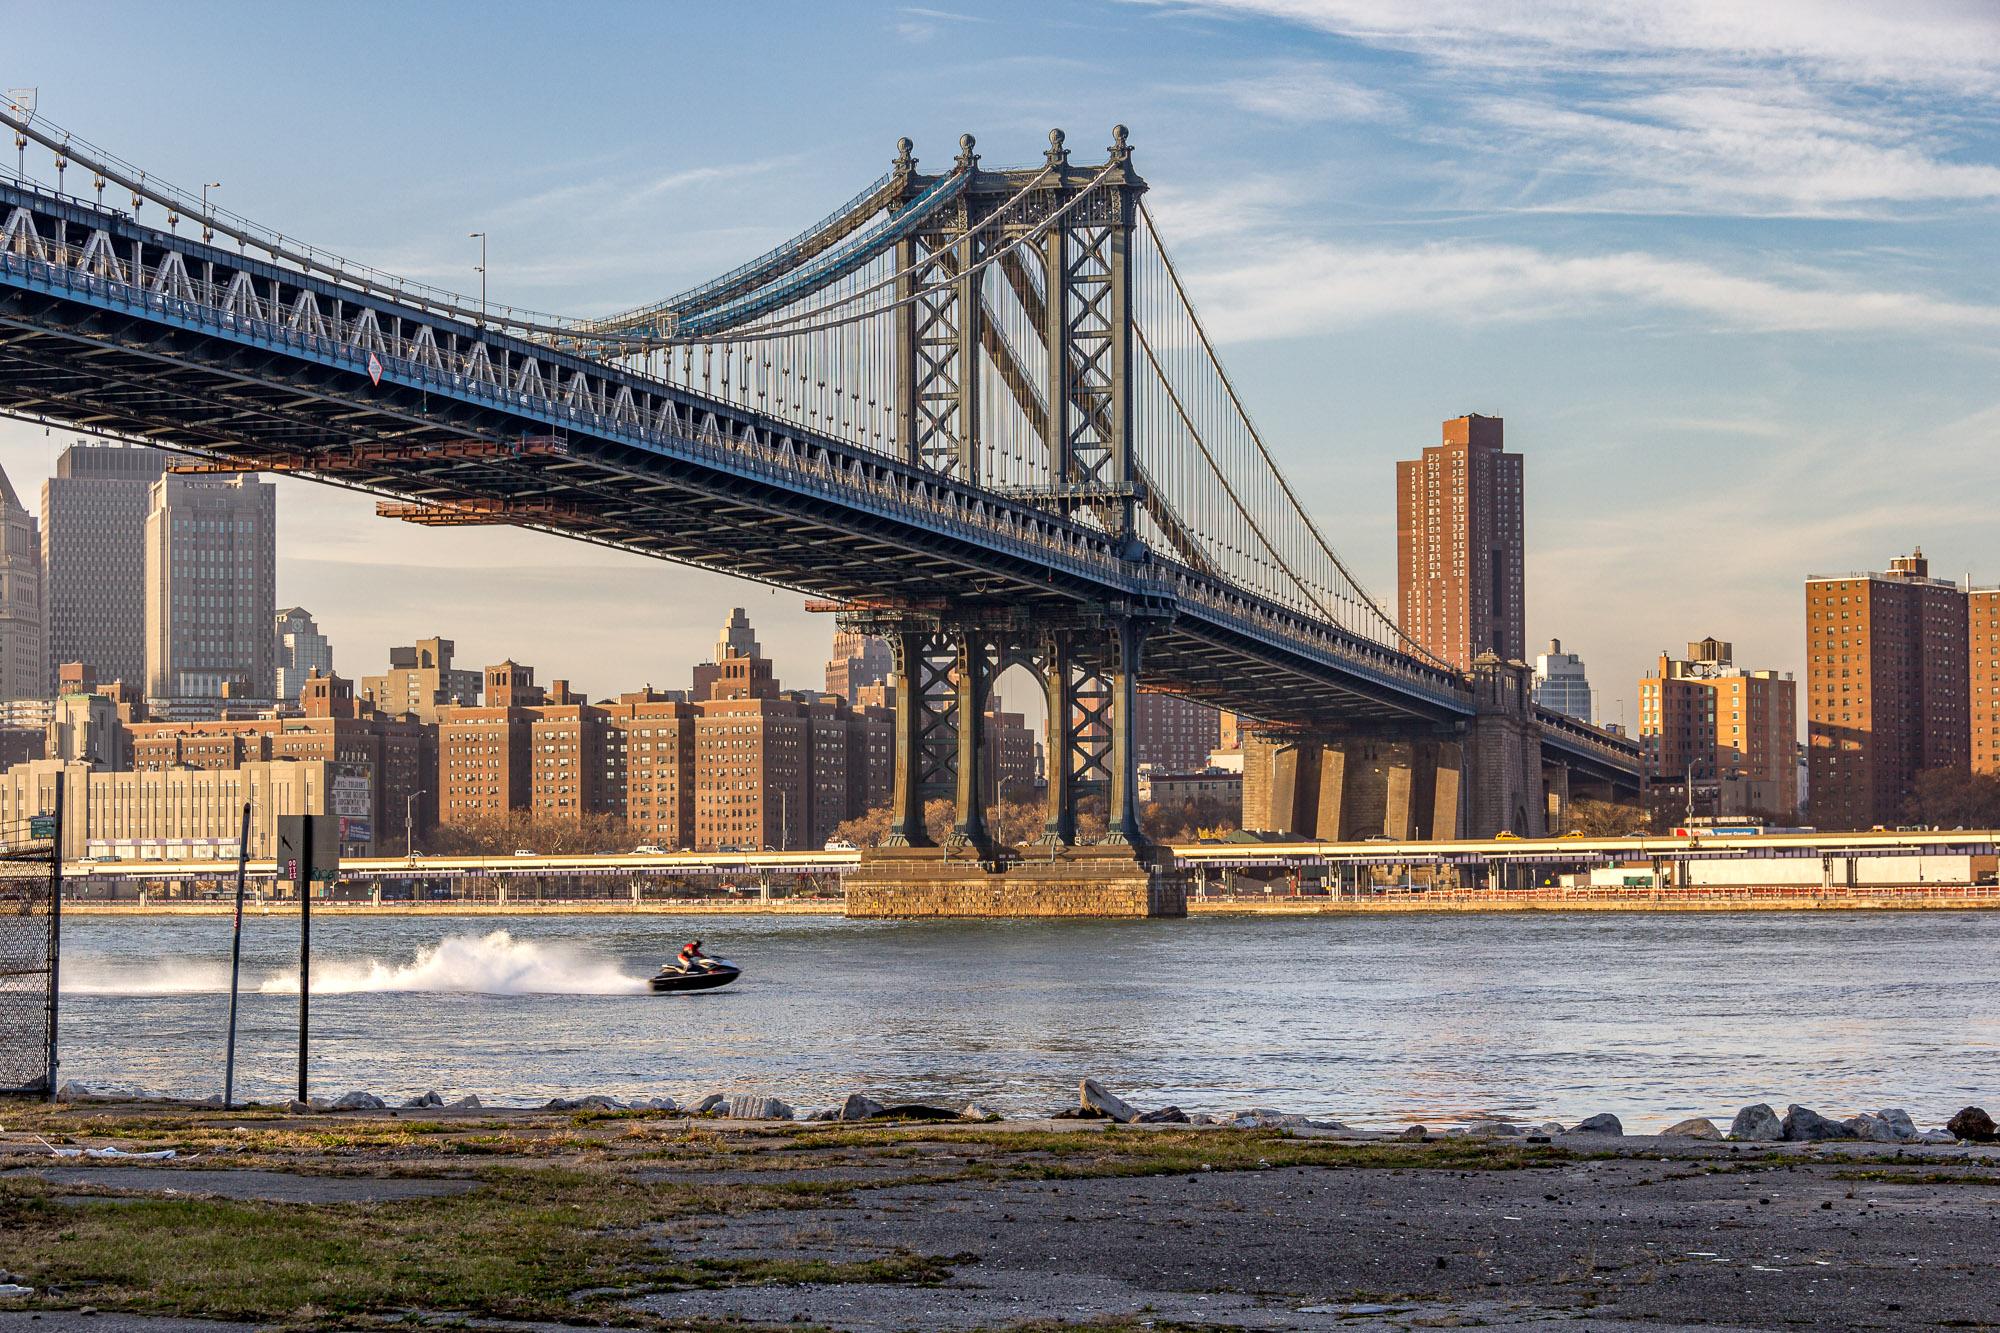 A dark blue metal bridge spans over the East River.